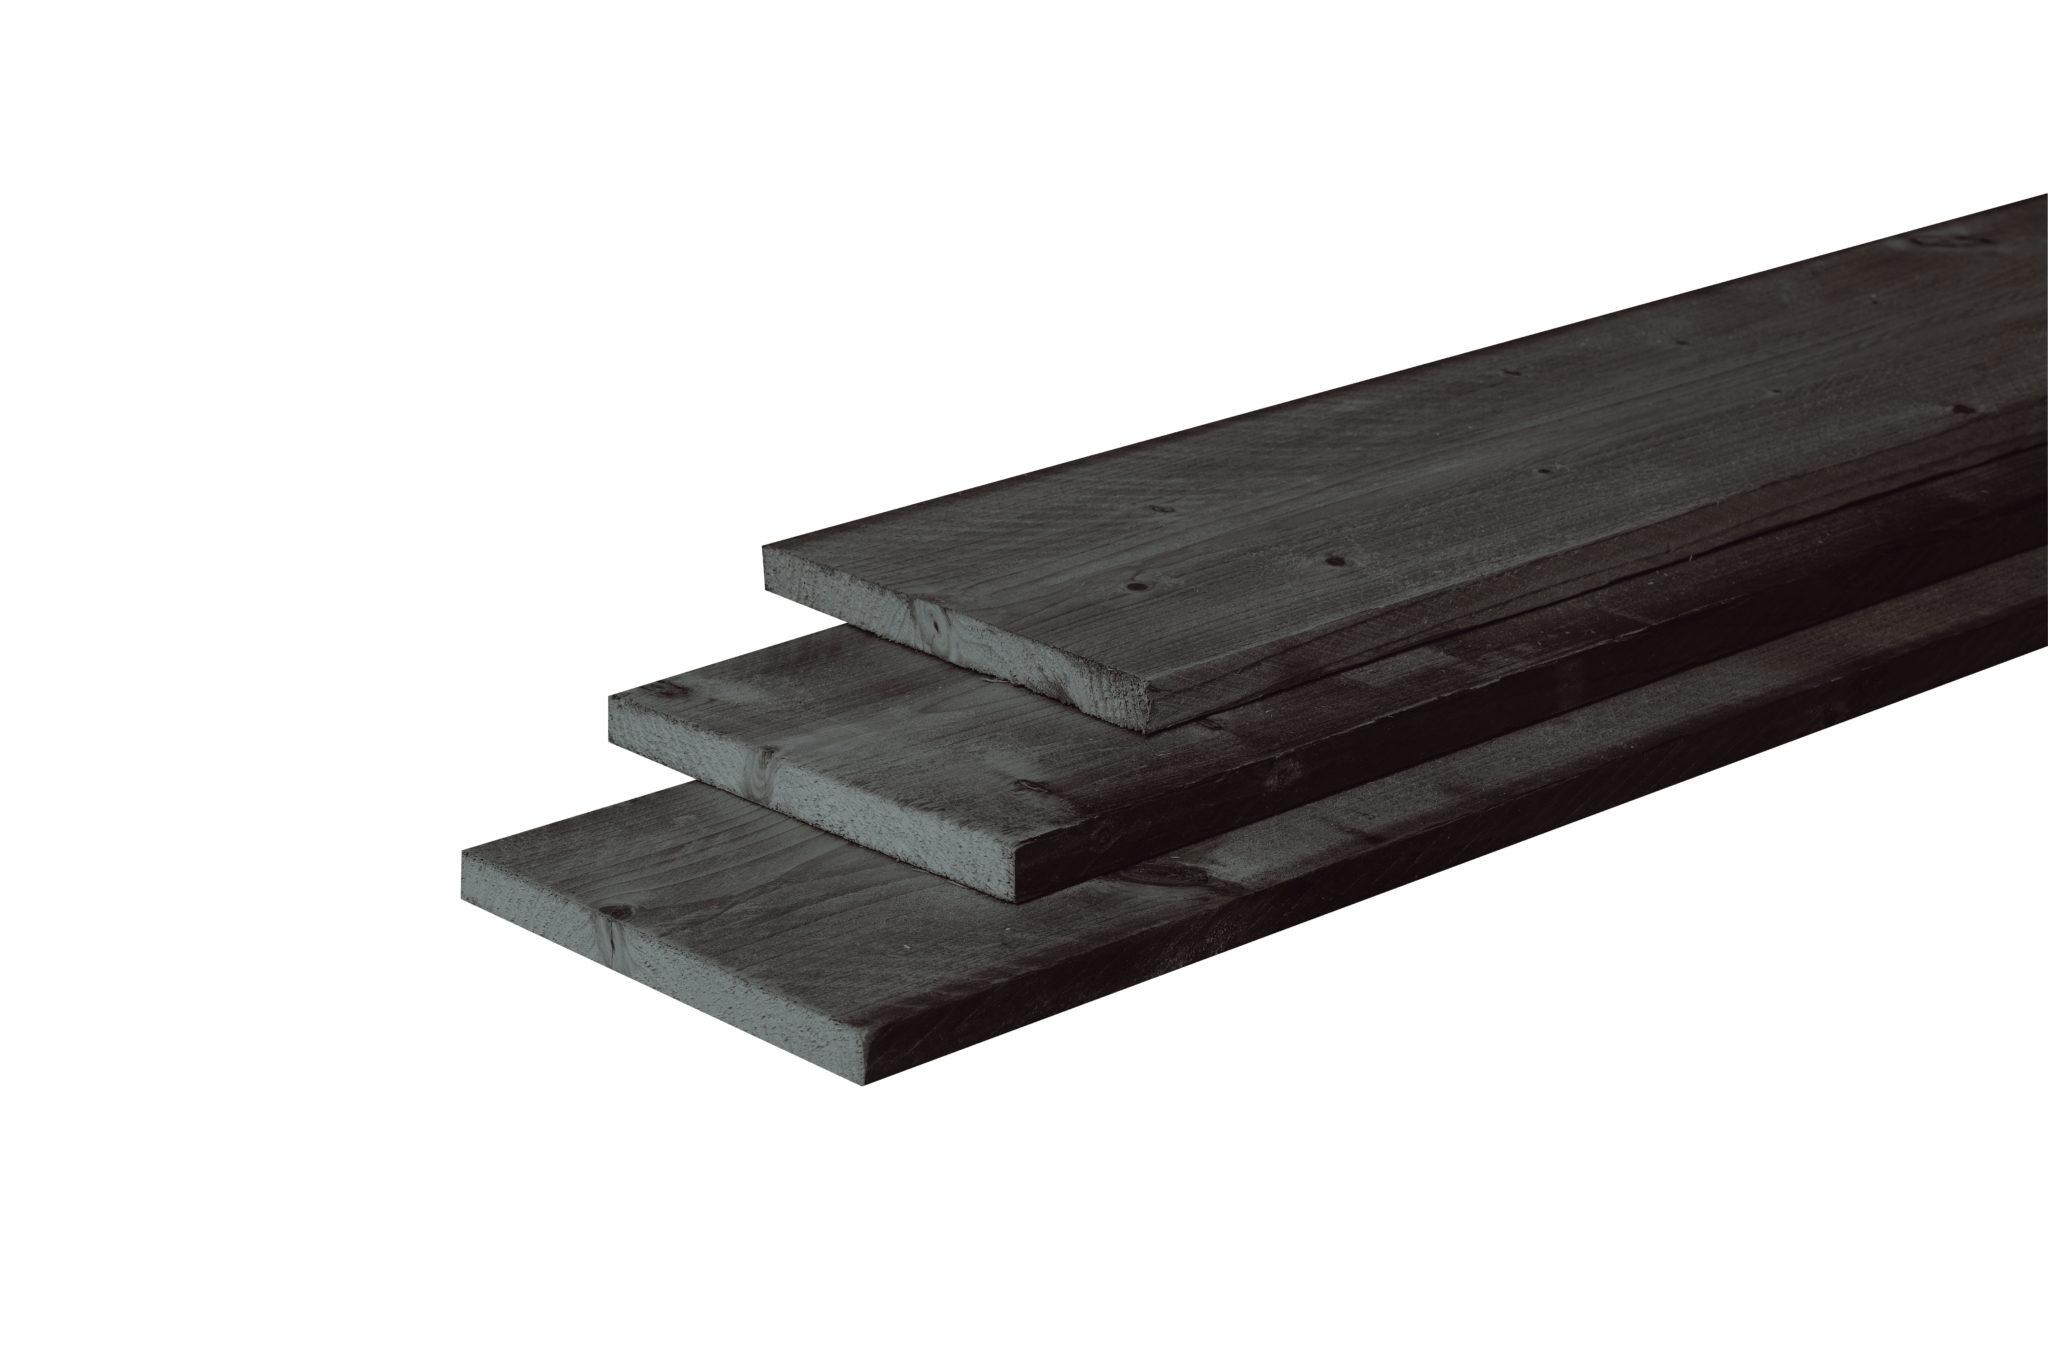 40649-Basic-fijnbezaagde-plank-douglas-zwart-tuintimmerhout